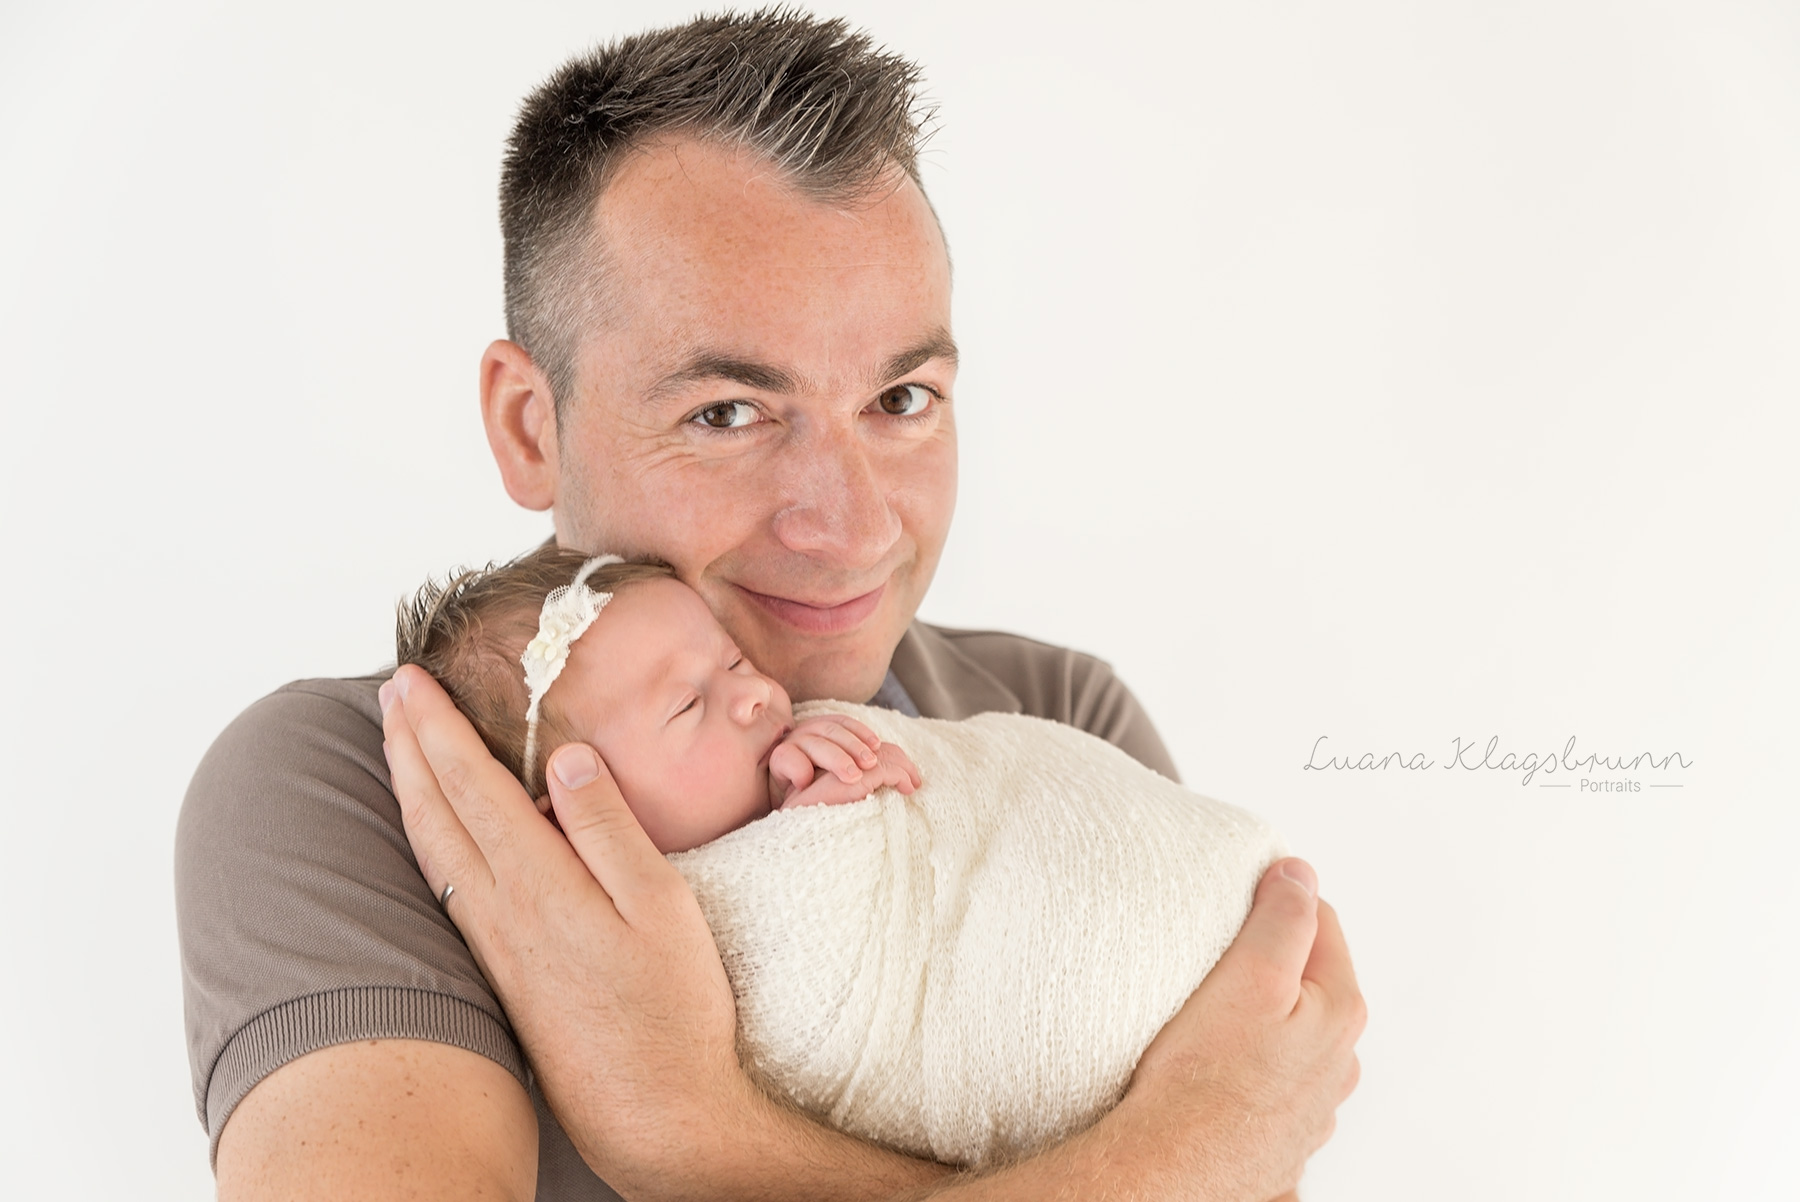 Babyfotografie Karlsruhe Luana Klagsbrunn5.jpg